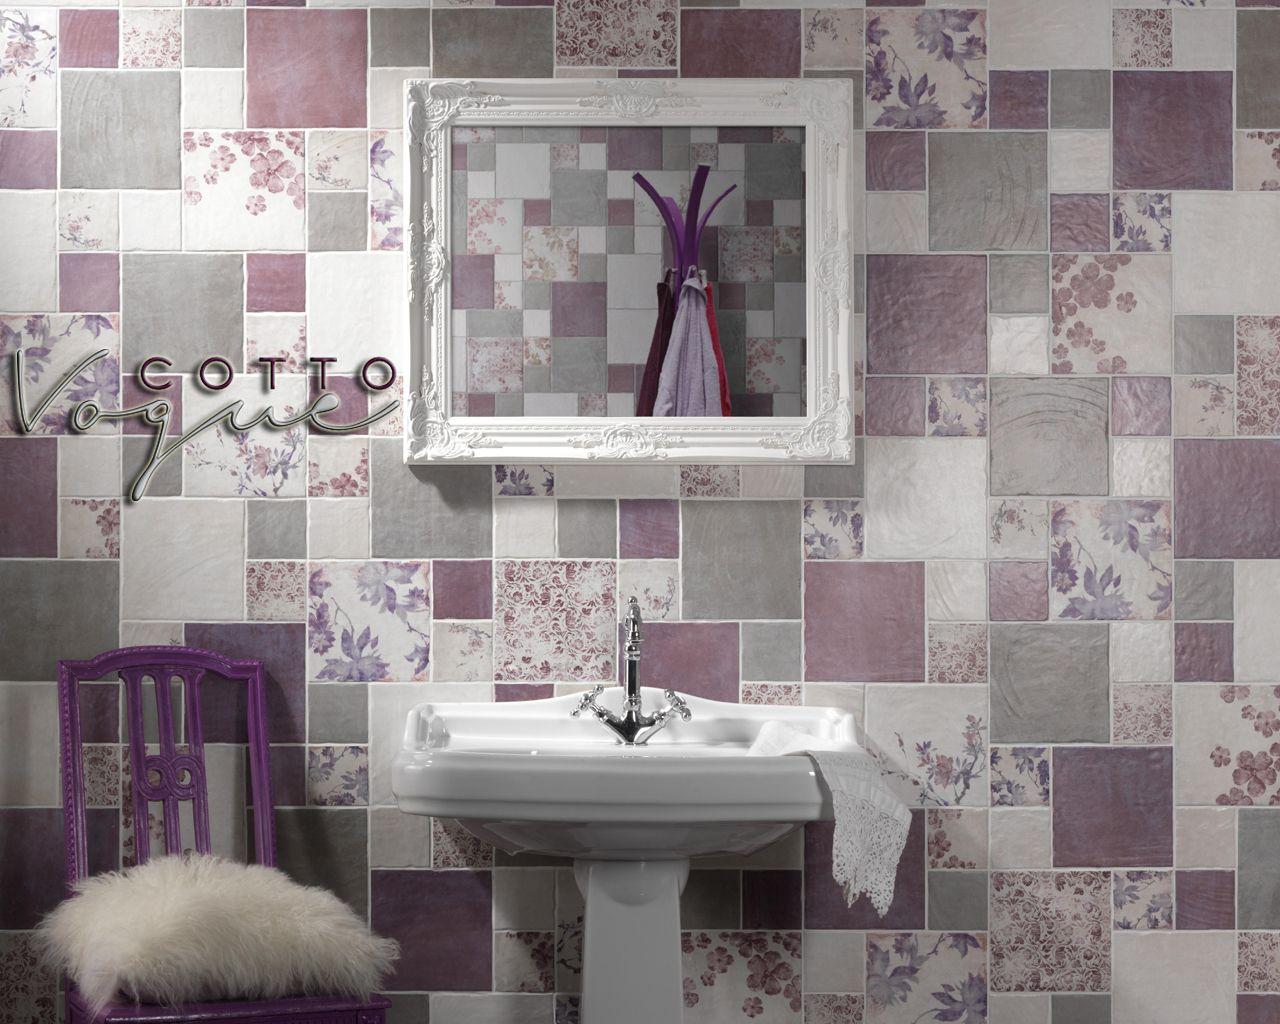 Piastrelle Bagno Mosaico Viola cotto tile composition by cir - #bathroom #gres #porcelain